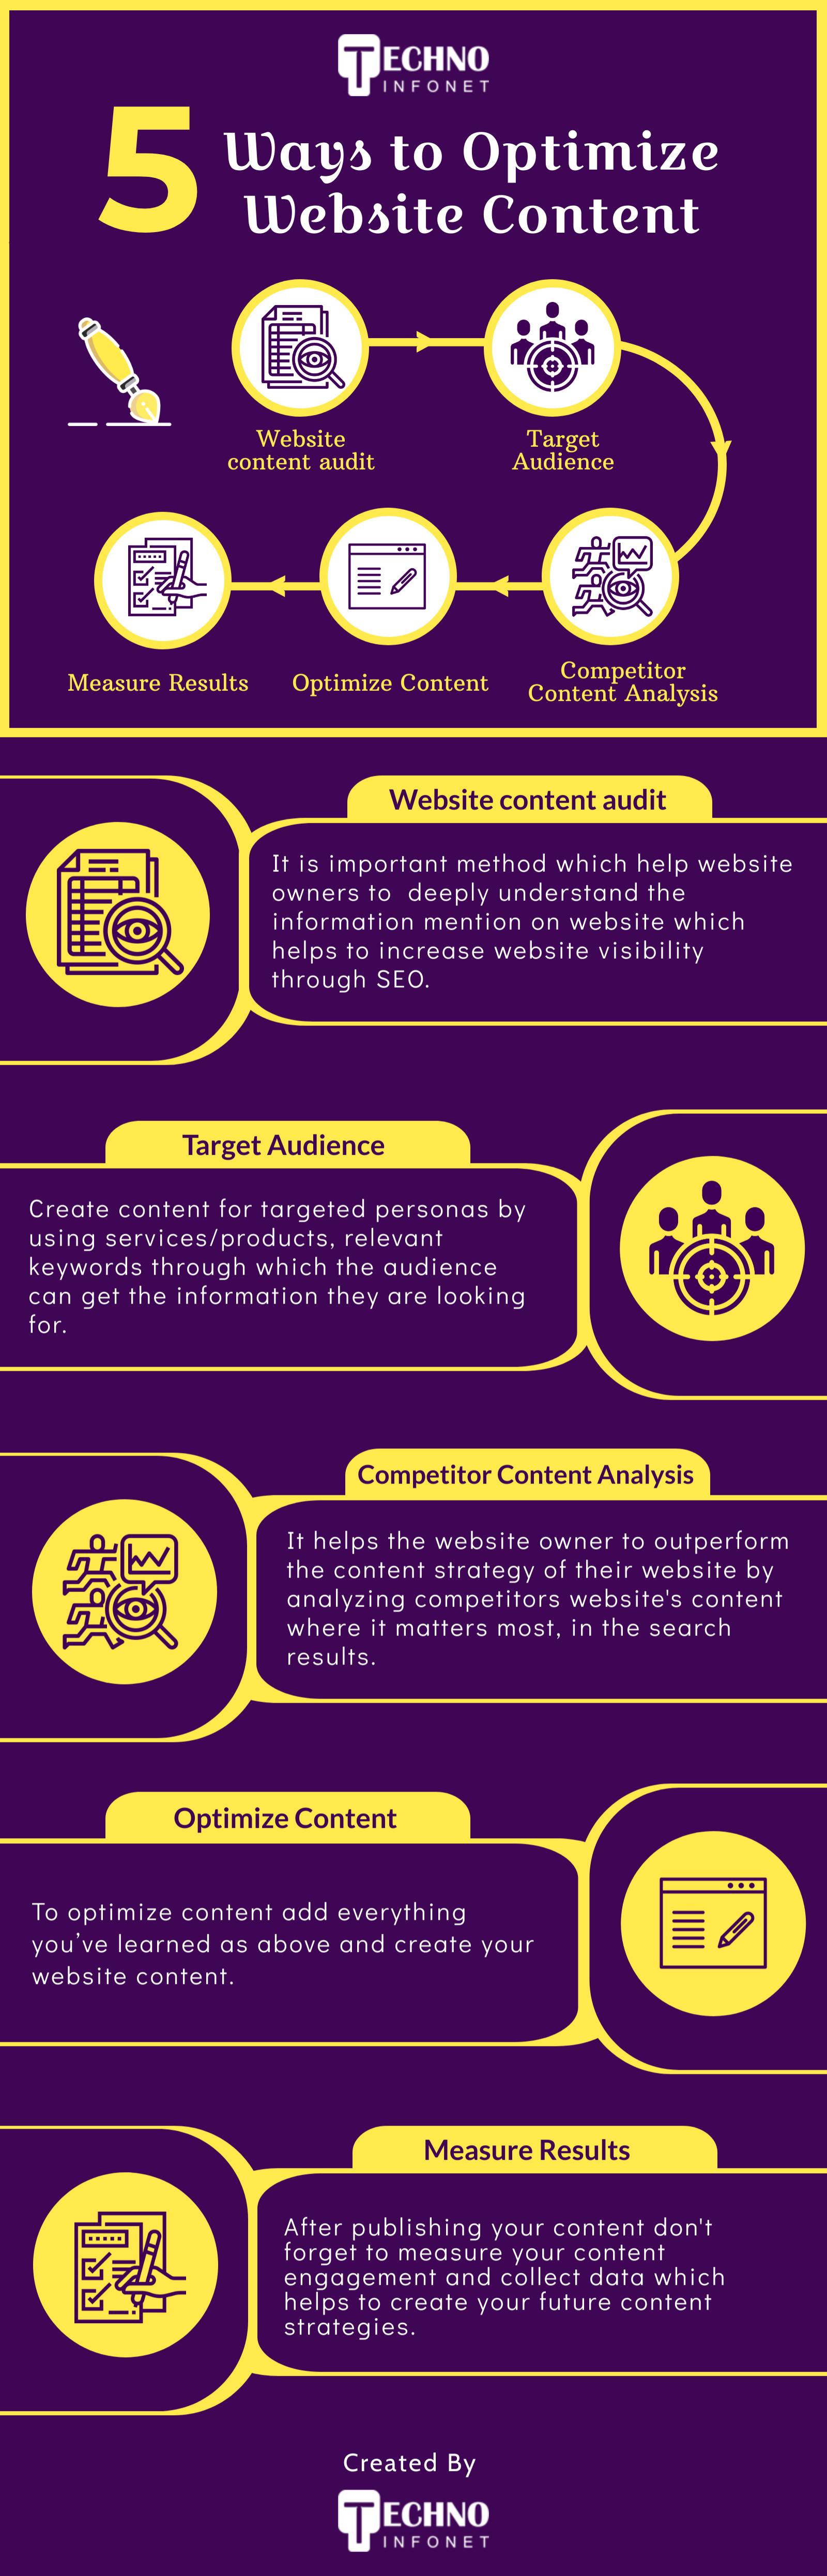 5 ways to Optimize Website Content